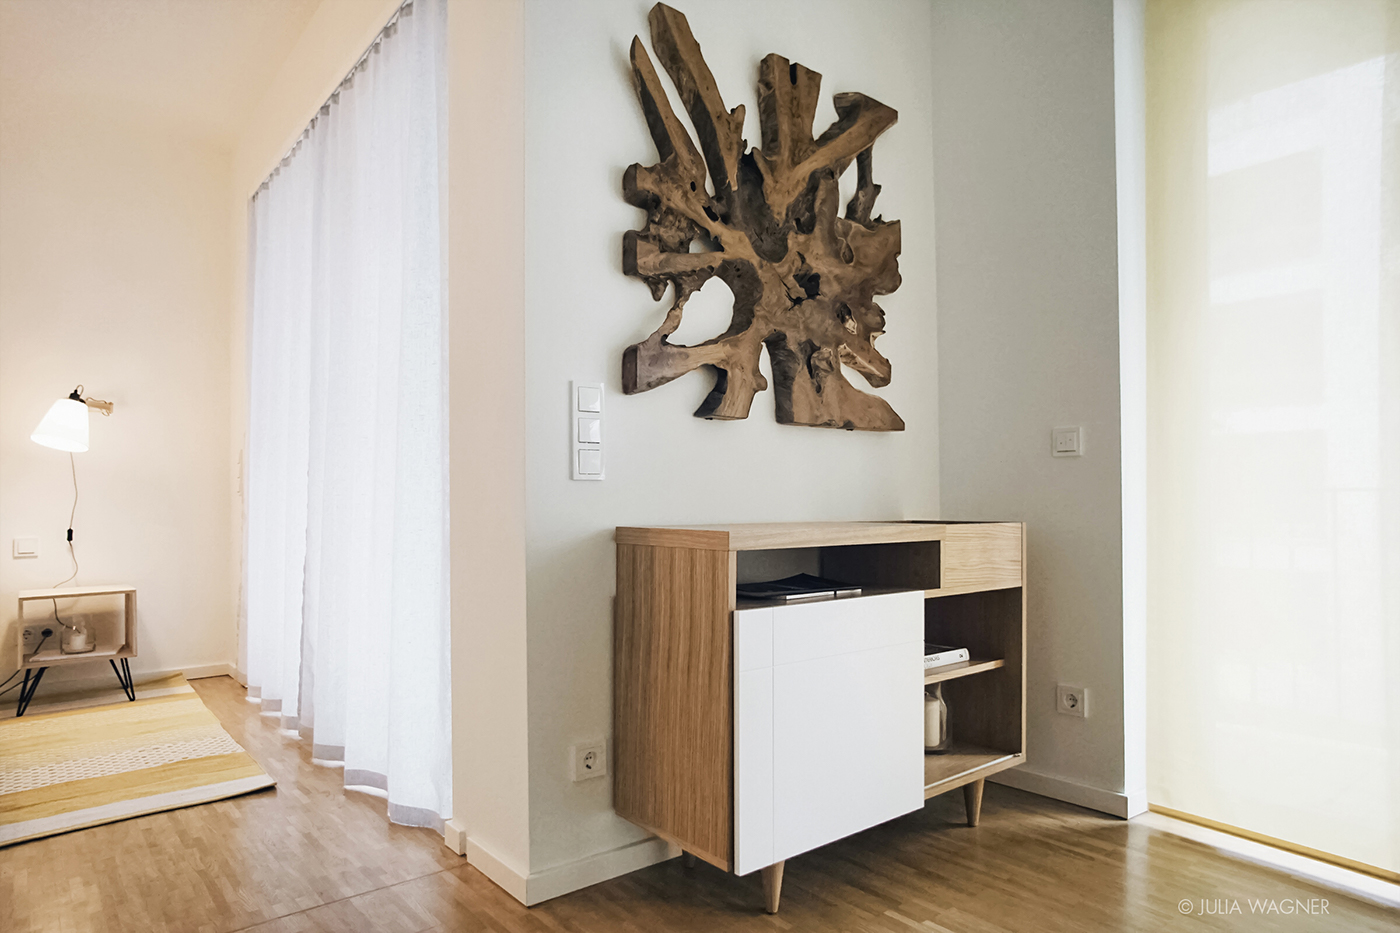 apartment design interior design  Scandinavian eco Retro modern berlin berlin design wood yellow